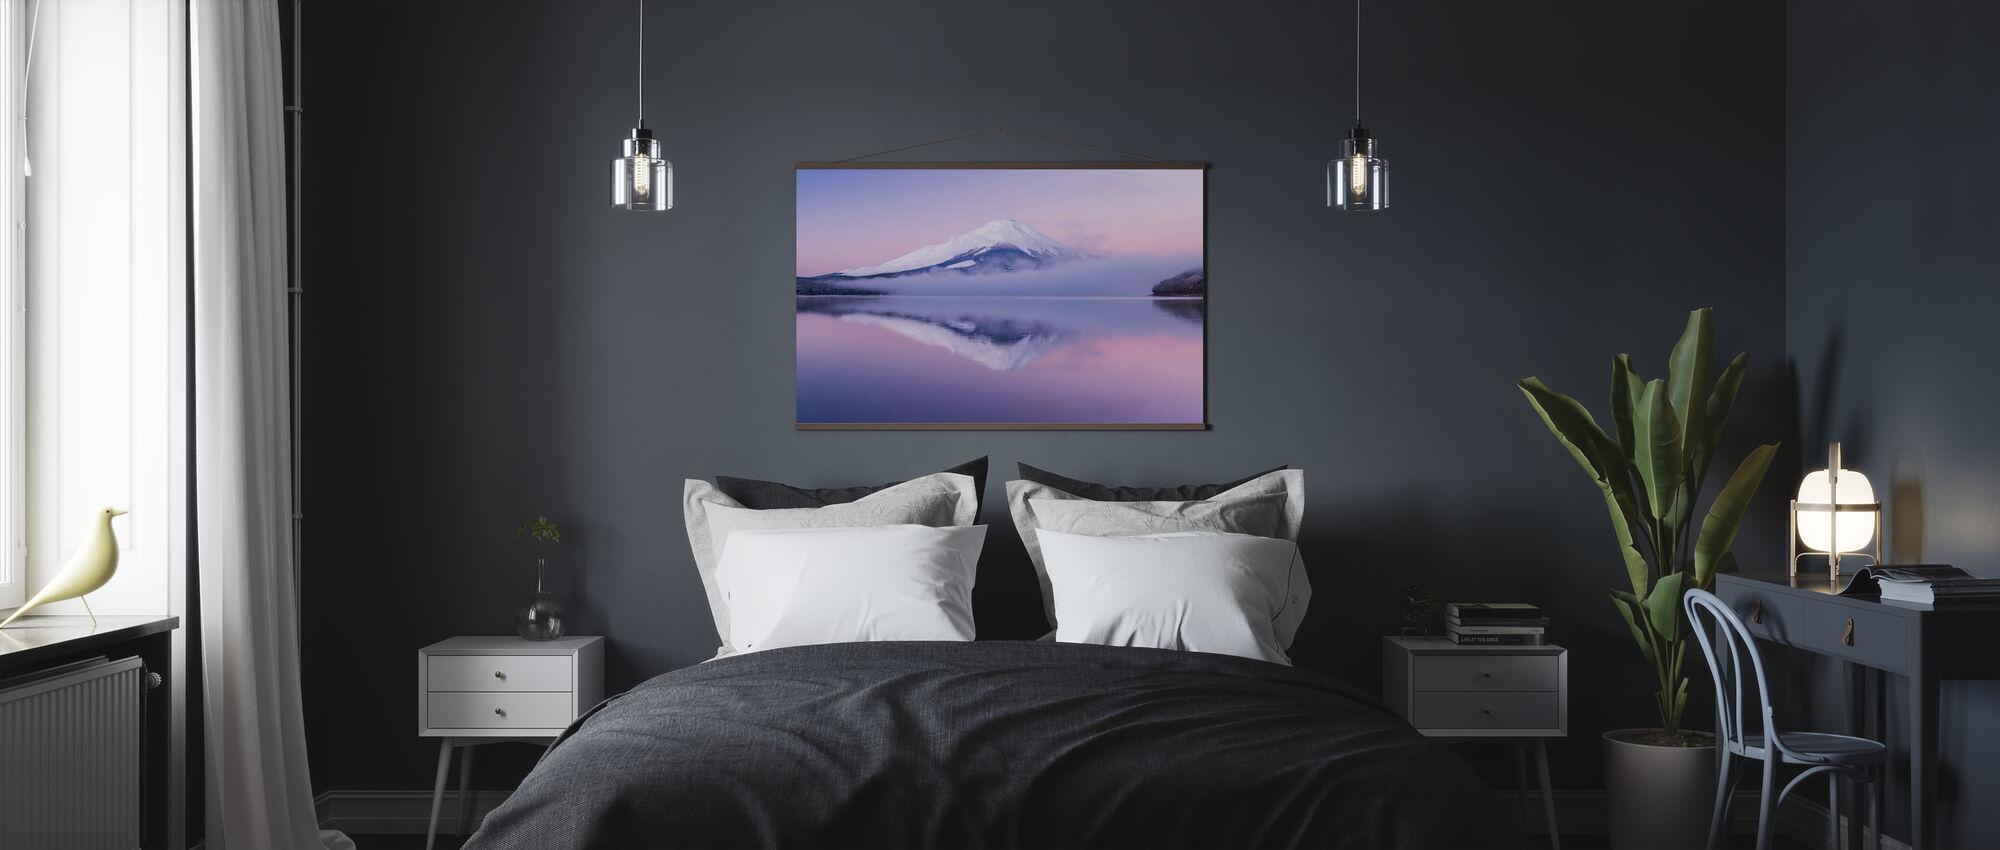 Morning in Veil - Poster - Bedroom